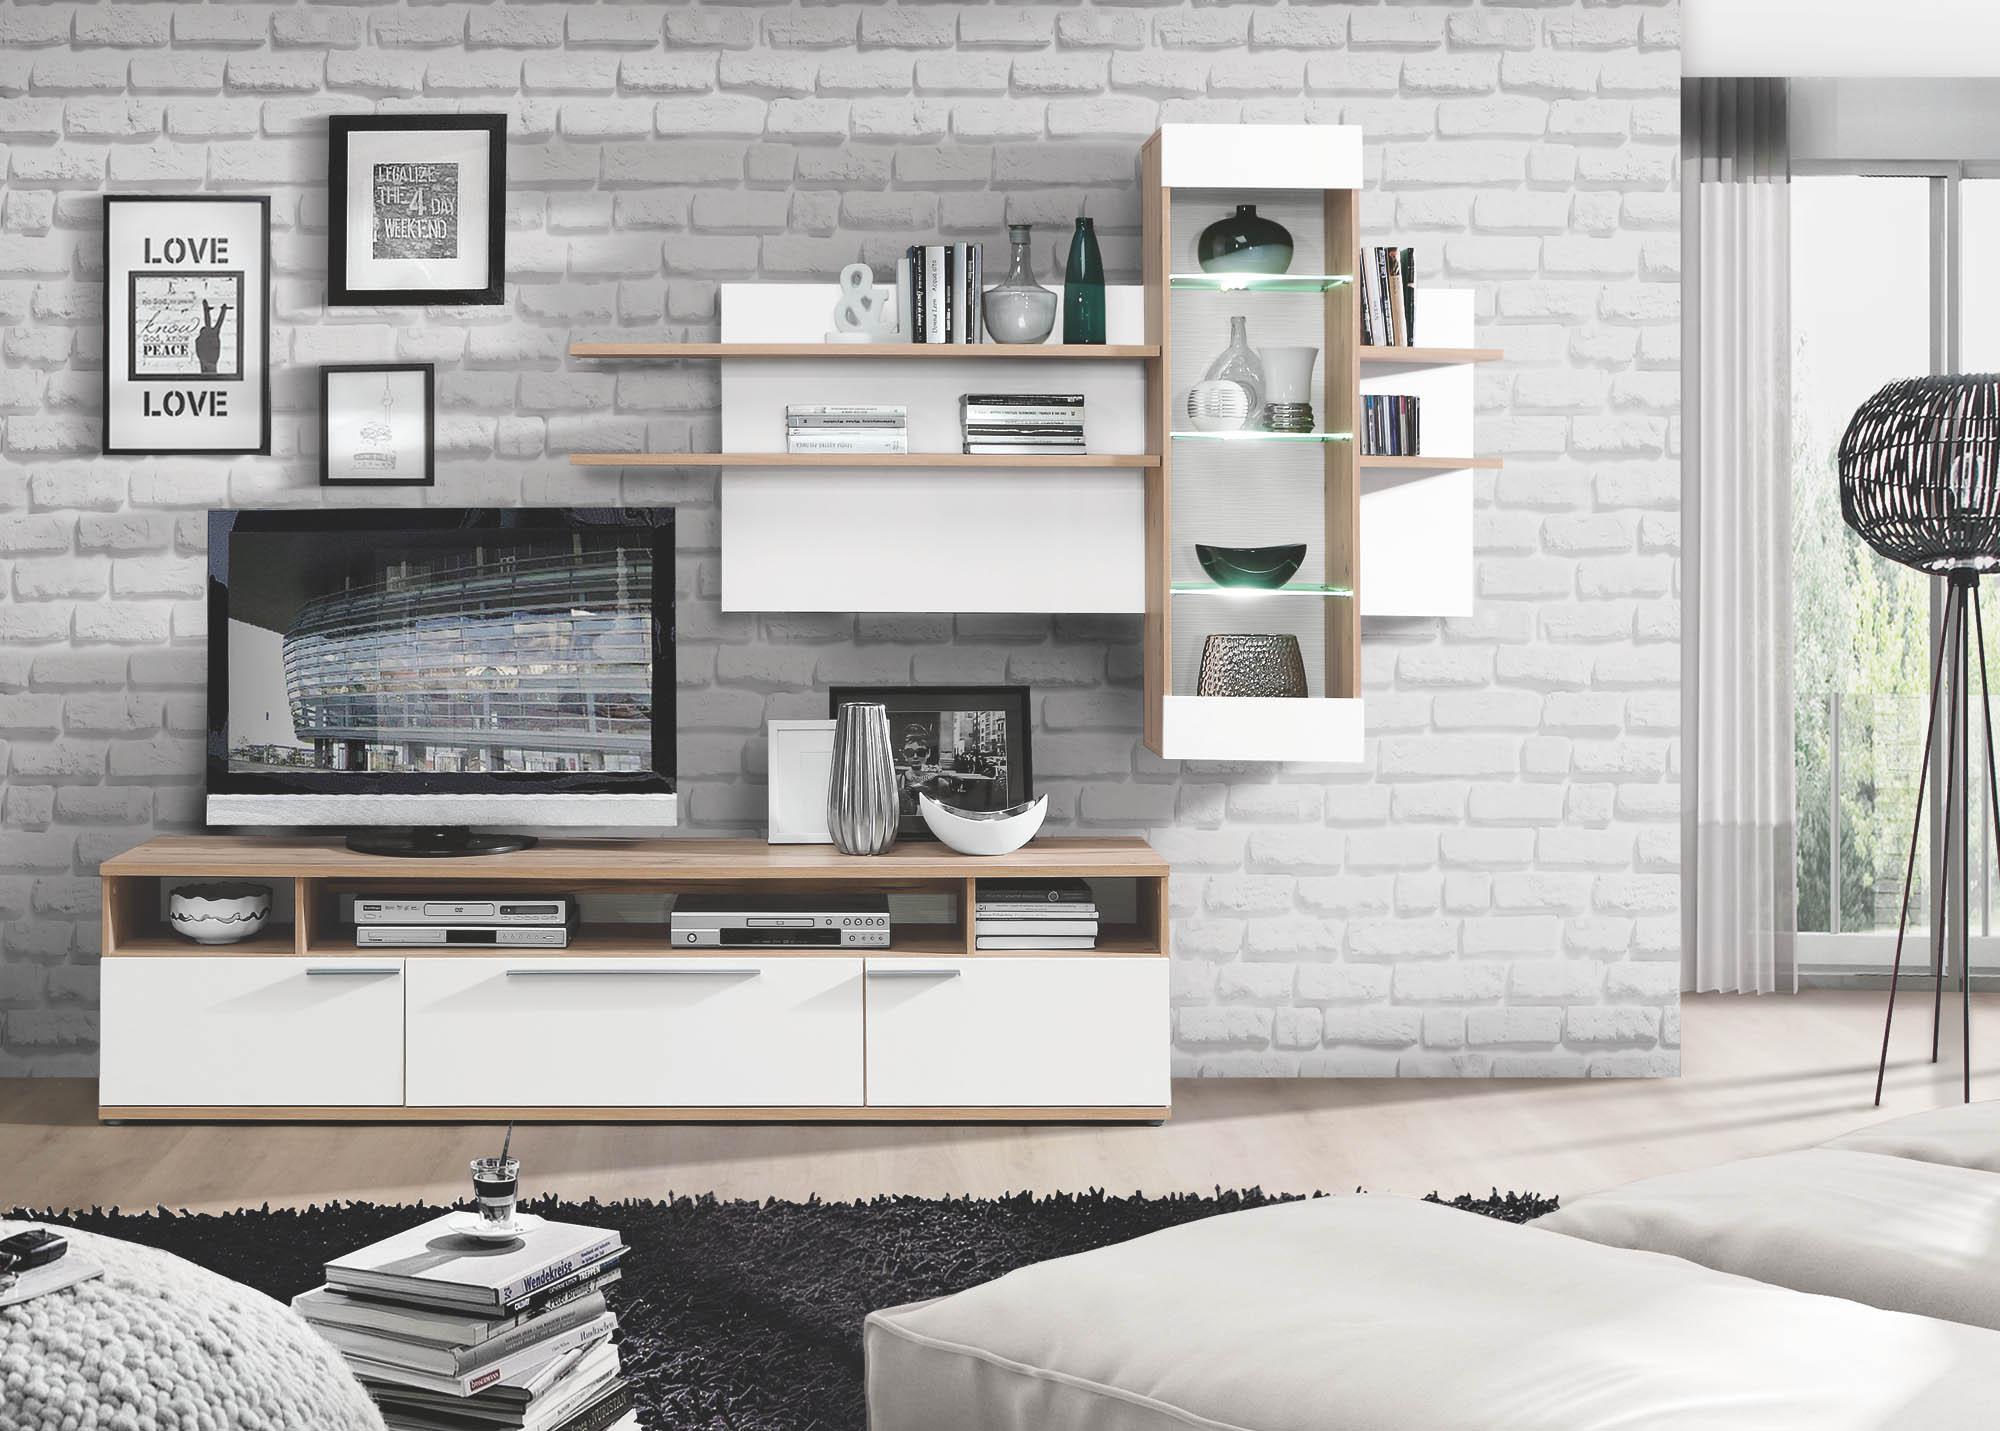 wohnwand freedom wohnw nde wohnzimmer sortiment. Black Bedroom Furniture Sets. Home Design Ideas